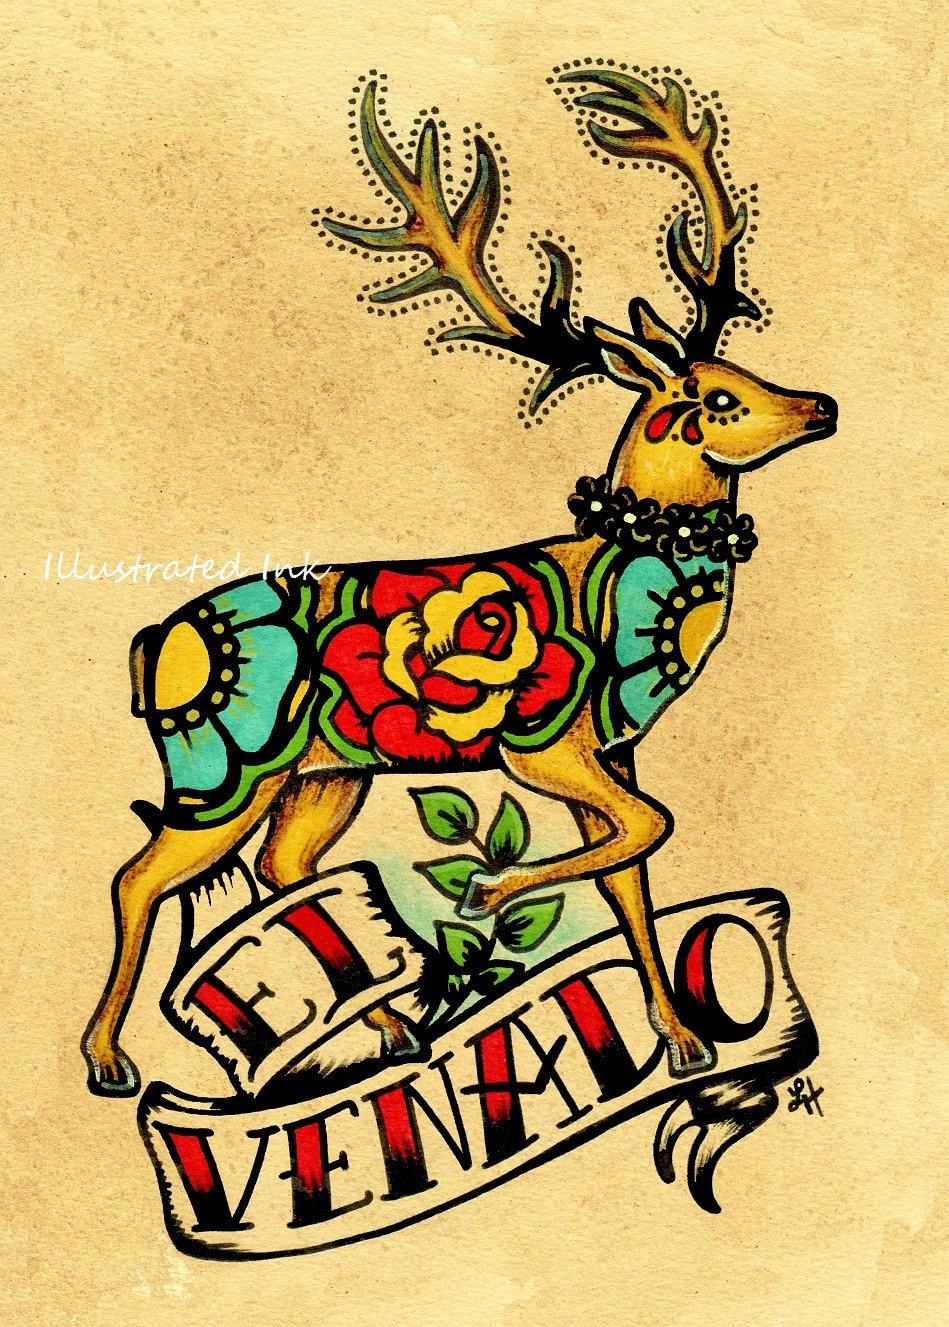 mexican folk art deer el venado loteria print 5 by illustratedink. Black Bedroom Furniture Sets. Home Design Ideas